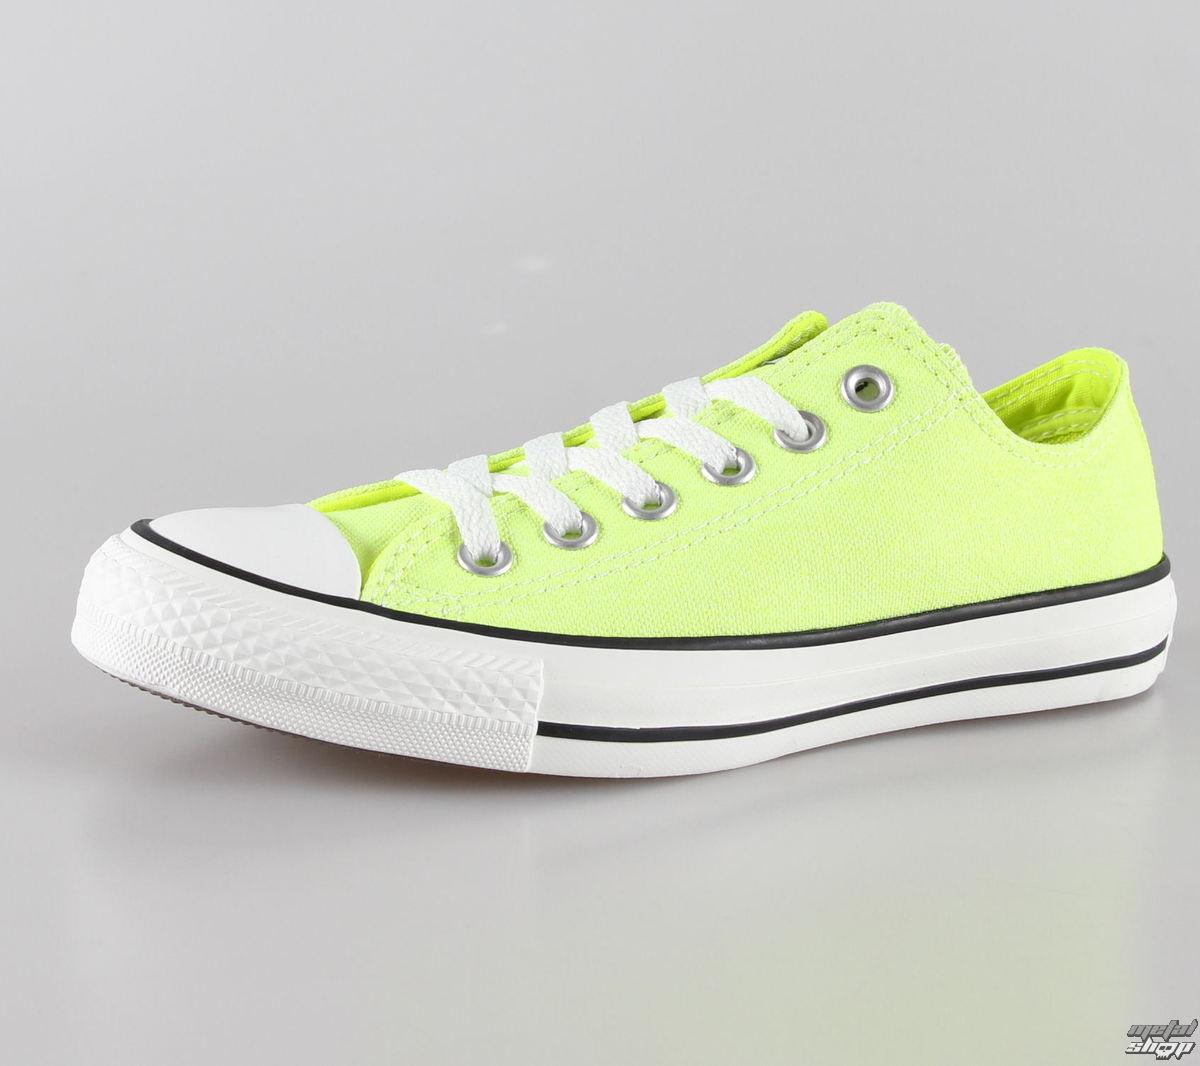 boty dámské CONVERSE - Chuck Taylor All Star OX - NEON - Neon Yellow - C136585